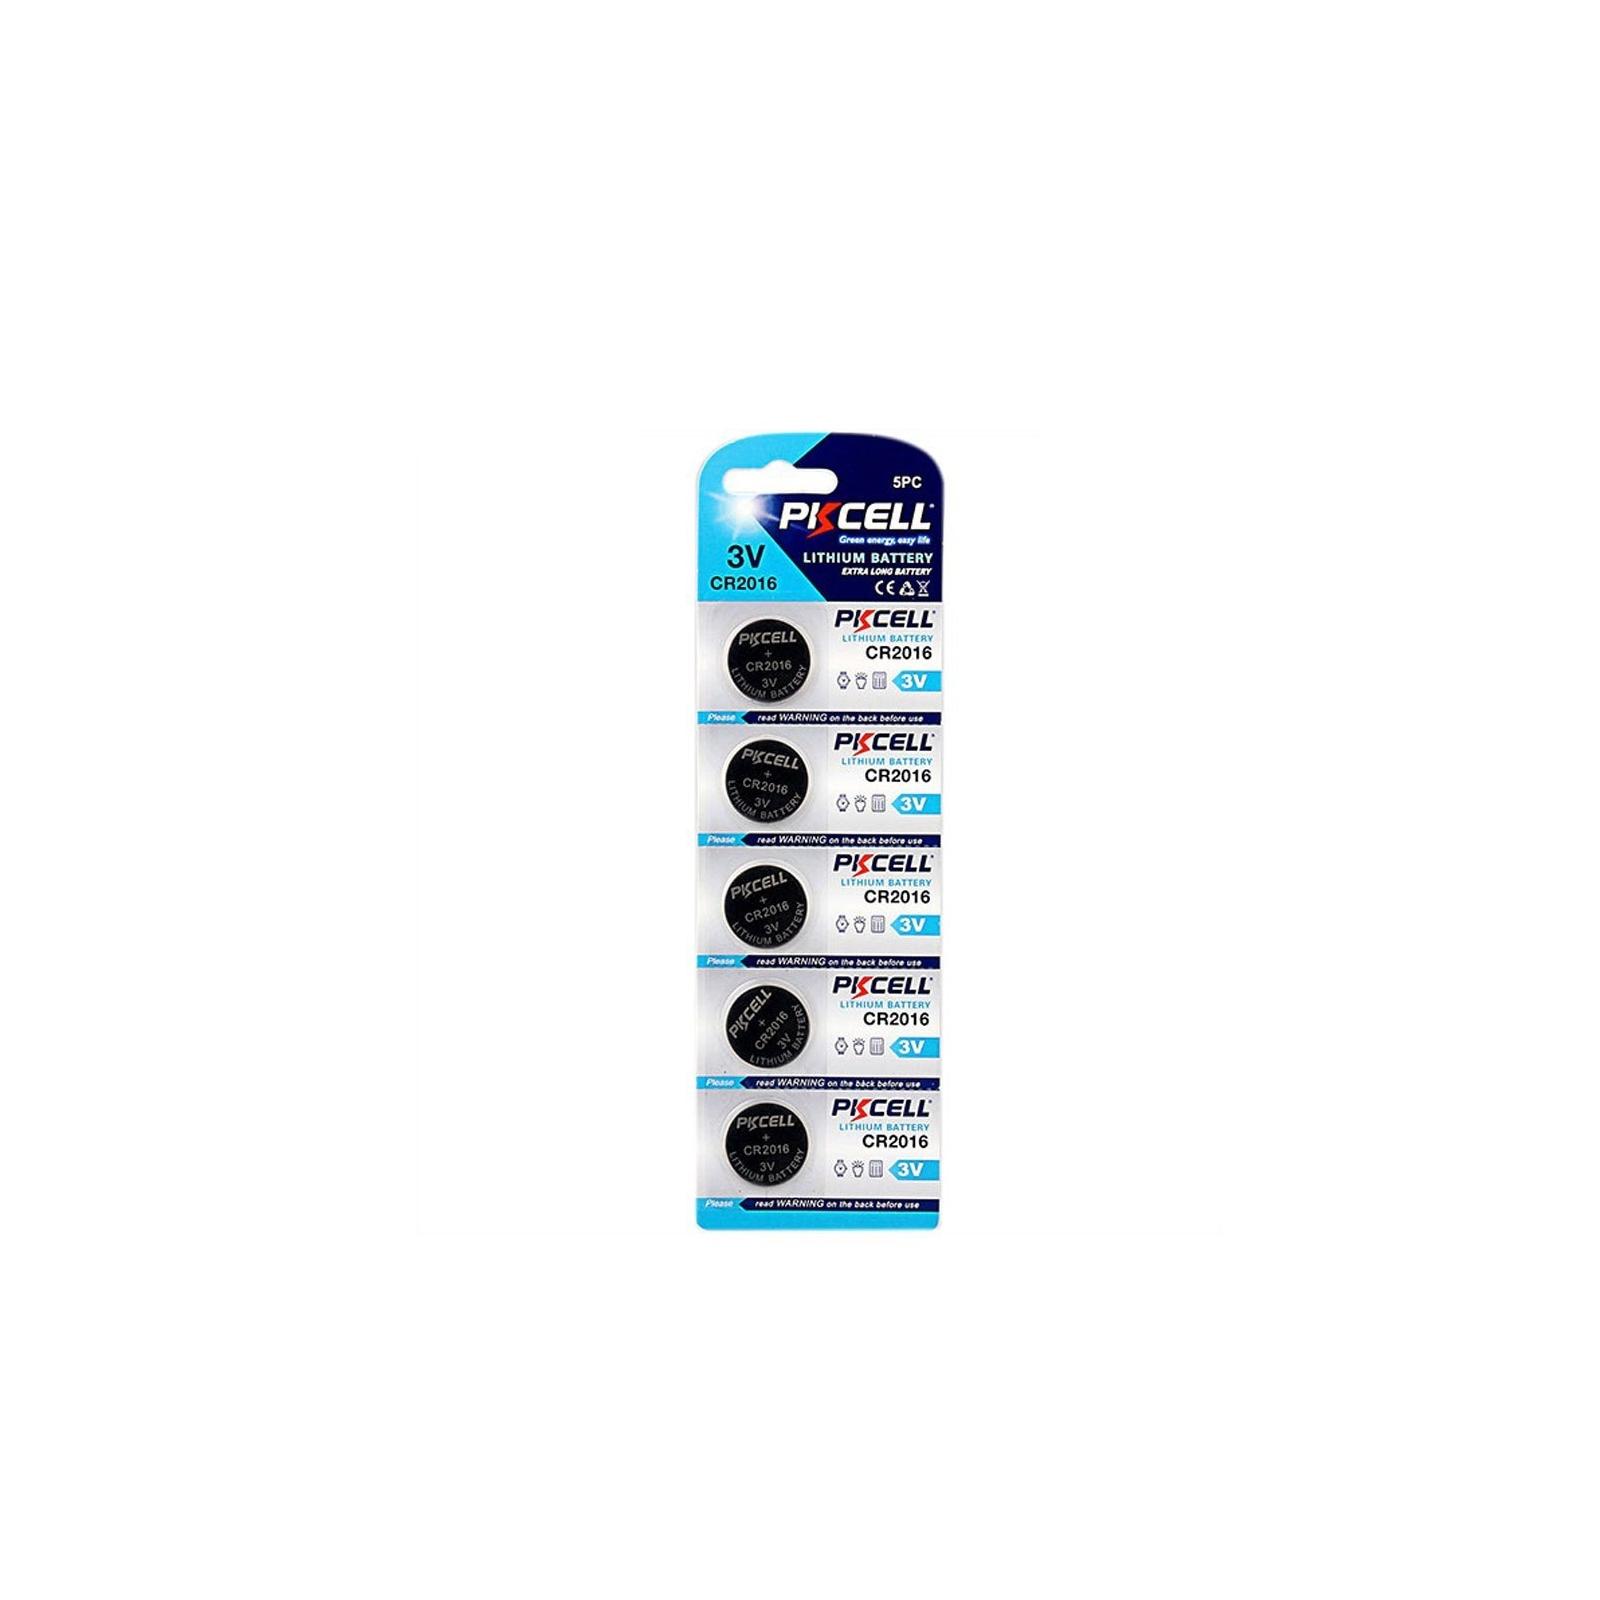 5 Piles Bouton CR2016 3V 75mAh Lithium PKCell